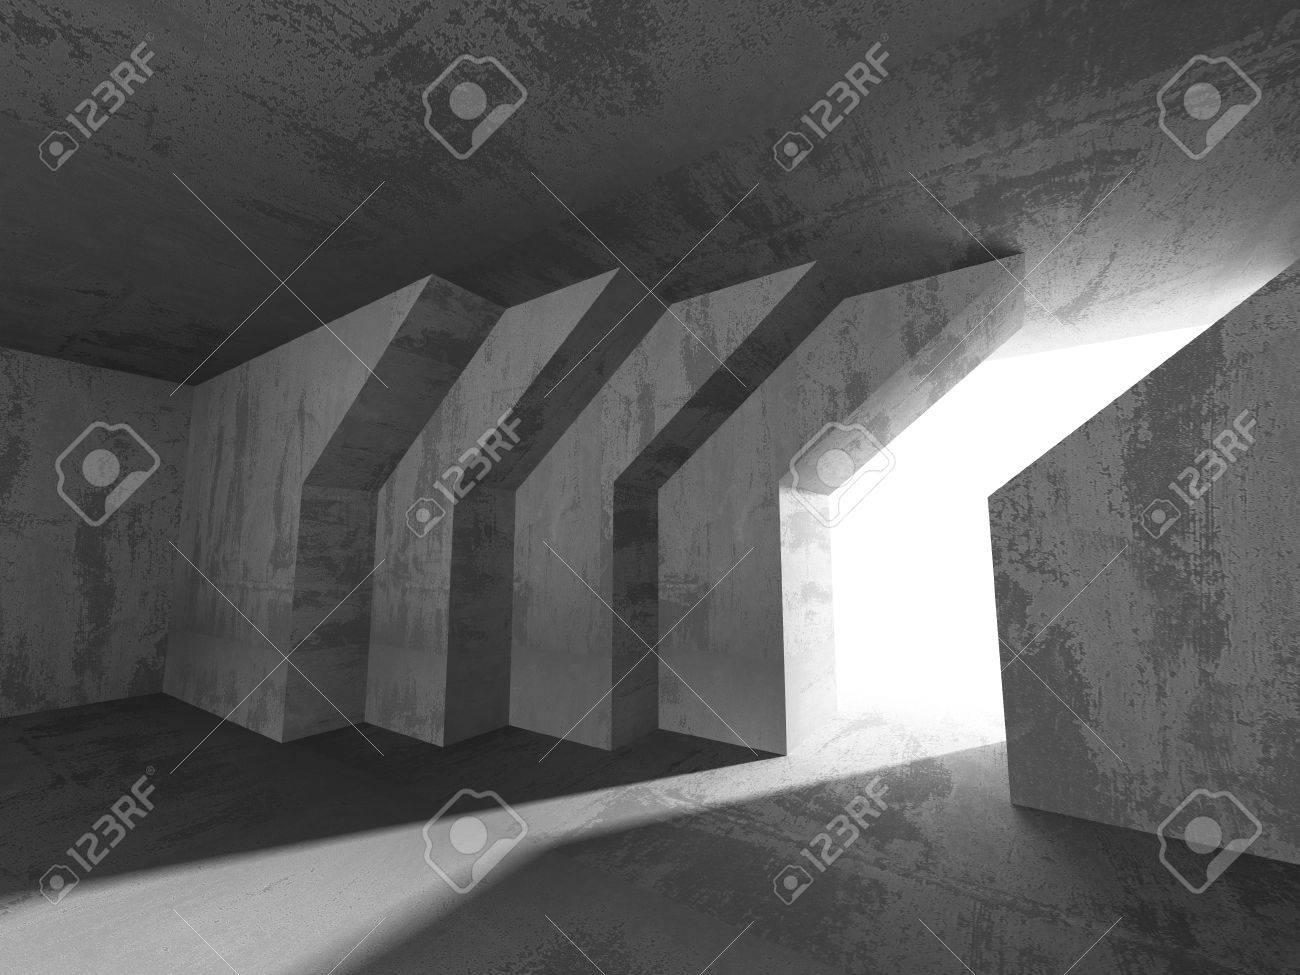 Fondo Concreto Arquitectura. Resumen Cuarto Oscuro Vacío. 3d ...